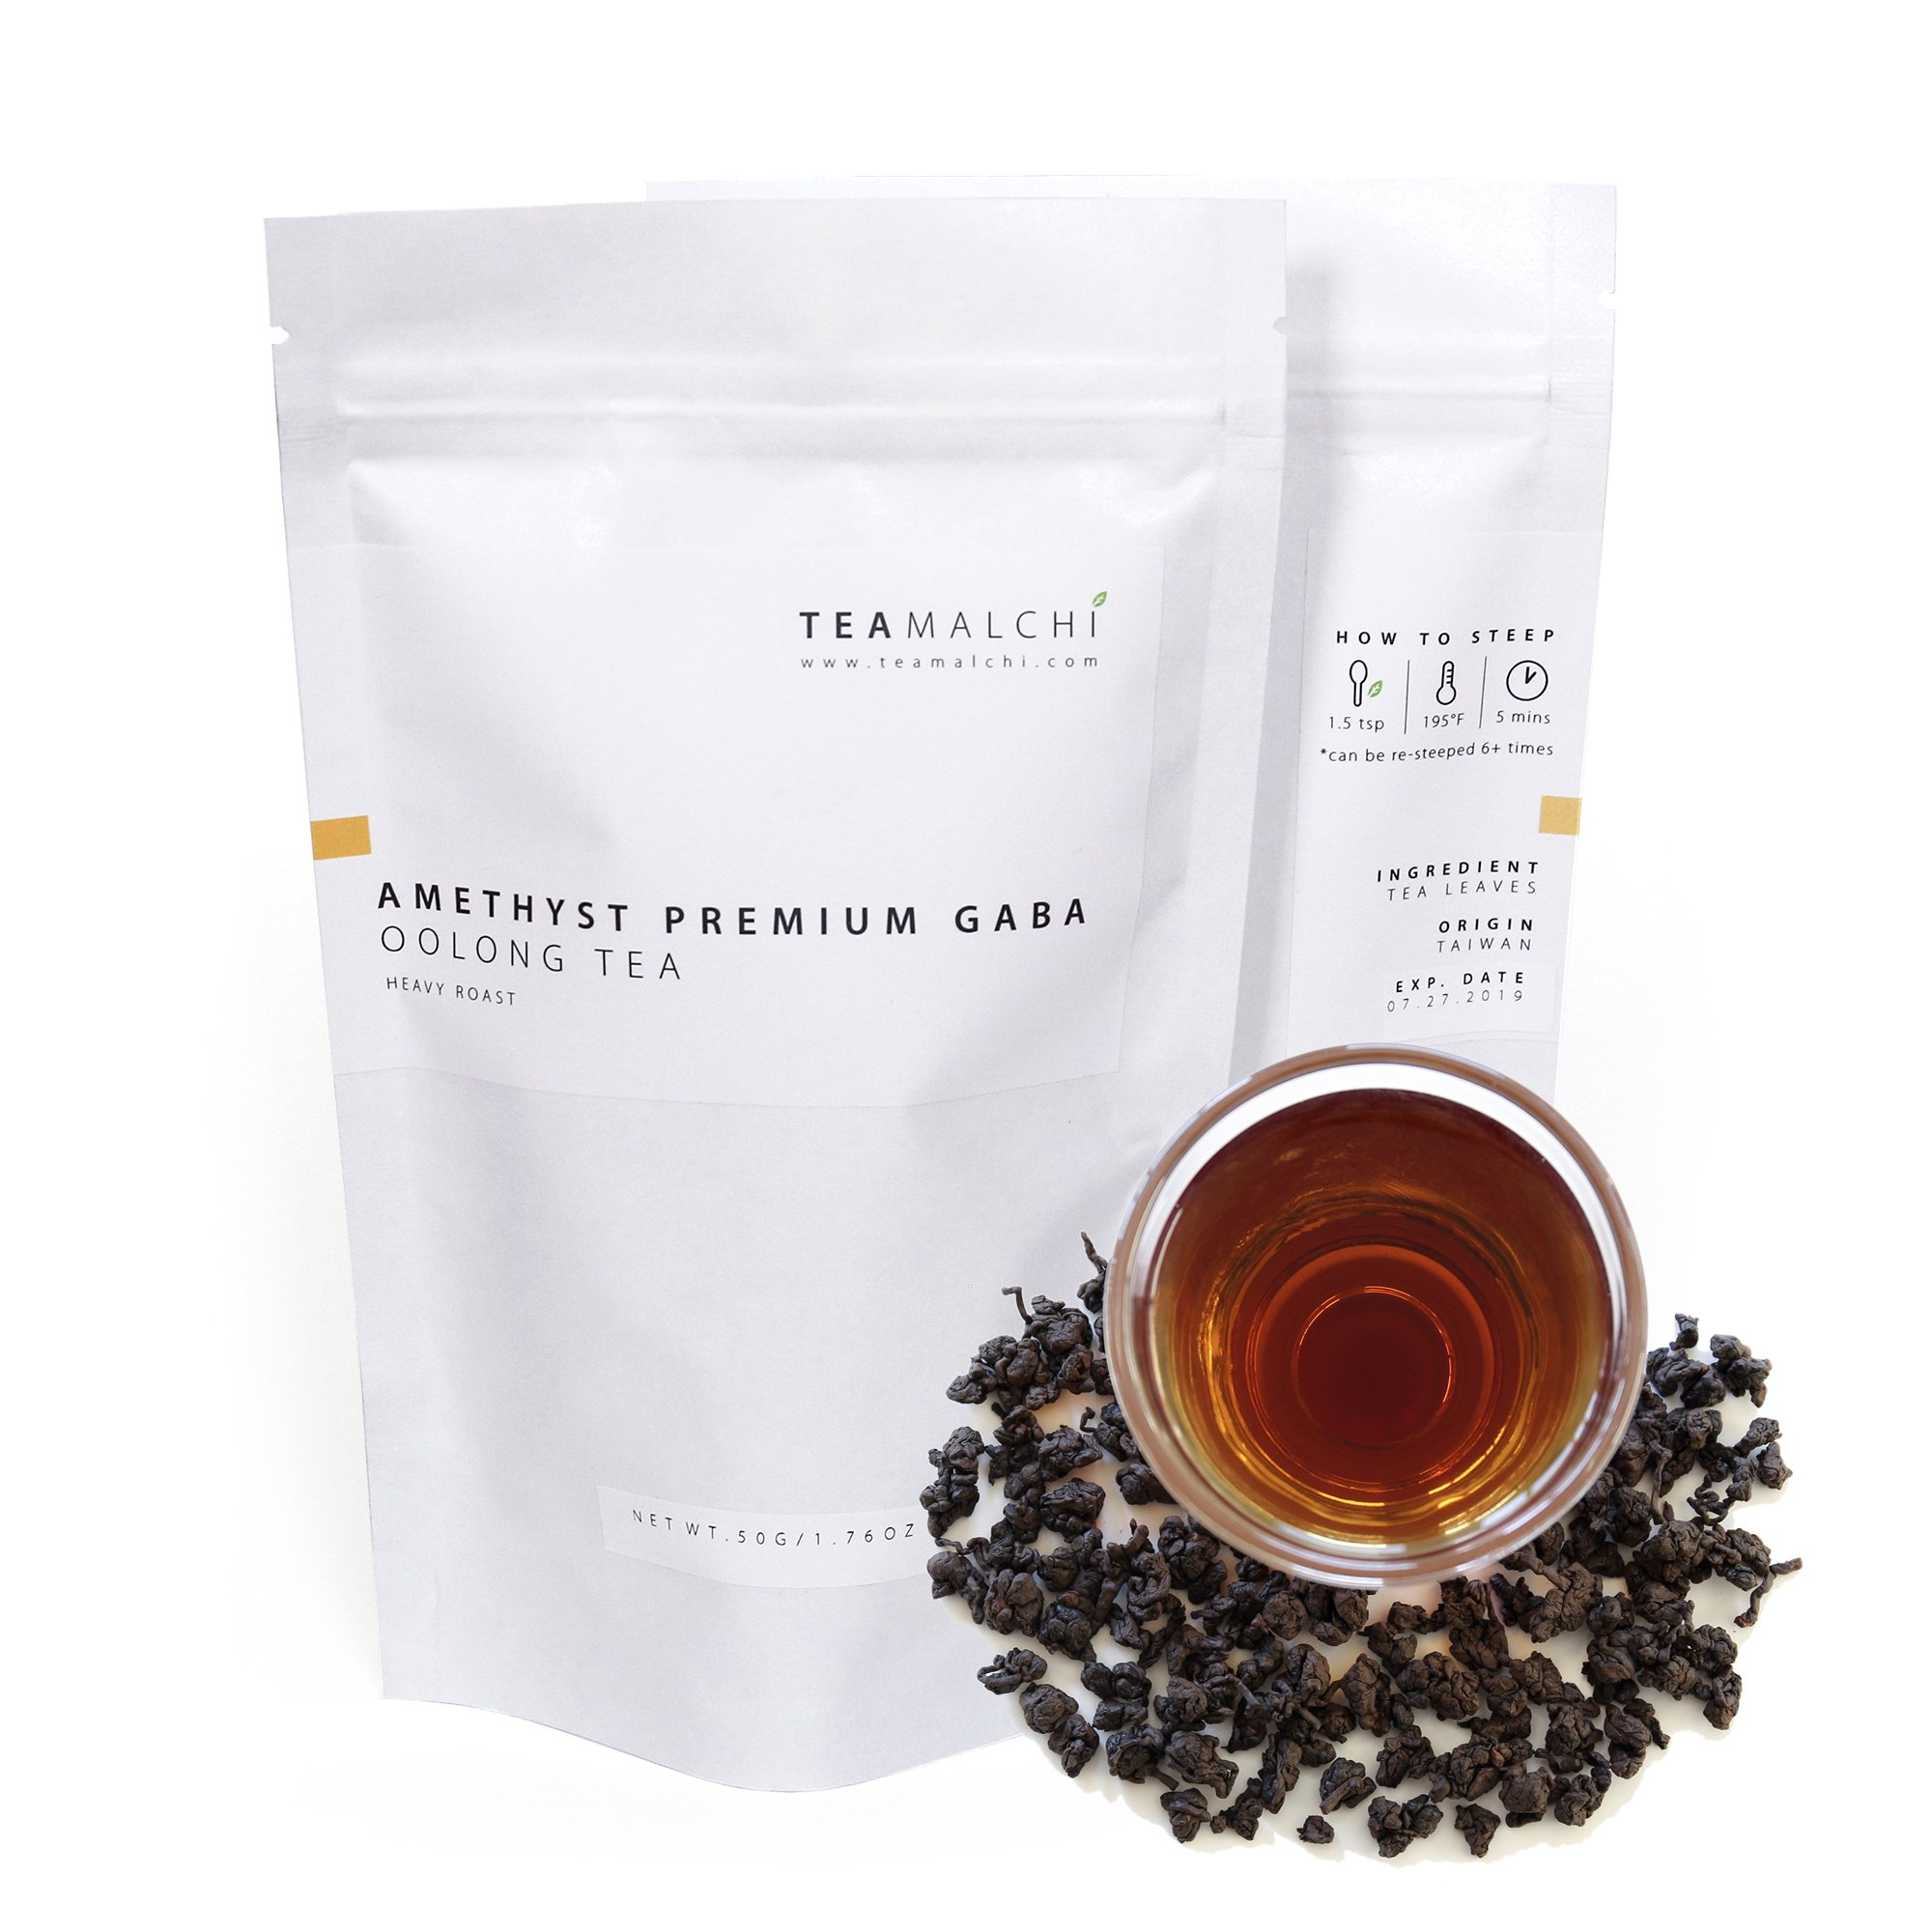 Premium Natural Taiwan High Mountain Amethyst GABA Loose Leaf Oolong Tea, 50g/1.76 oz